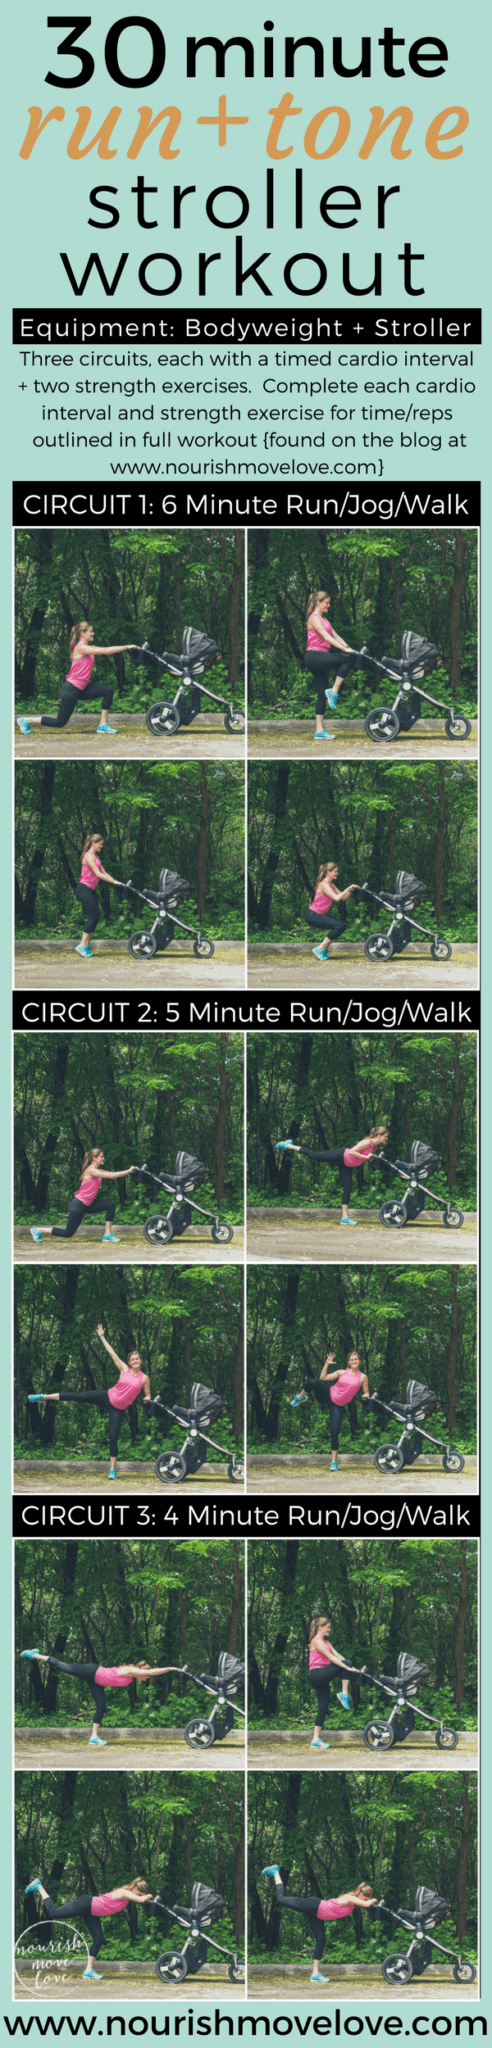 30 Minute Run + Tone Stroller Workout | www.nourishmovelove.com